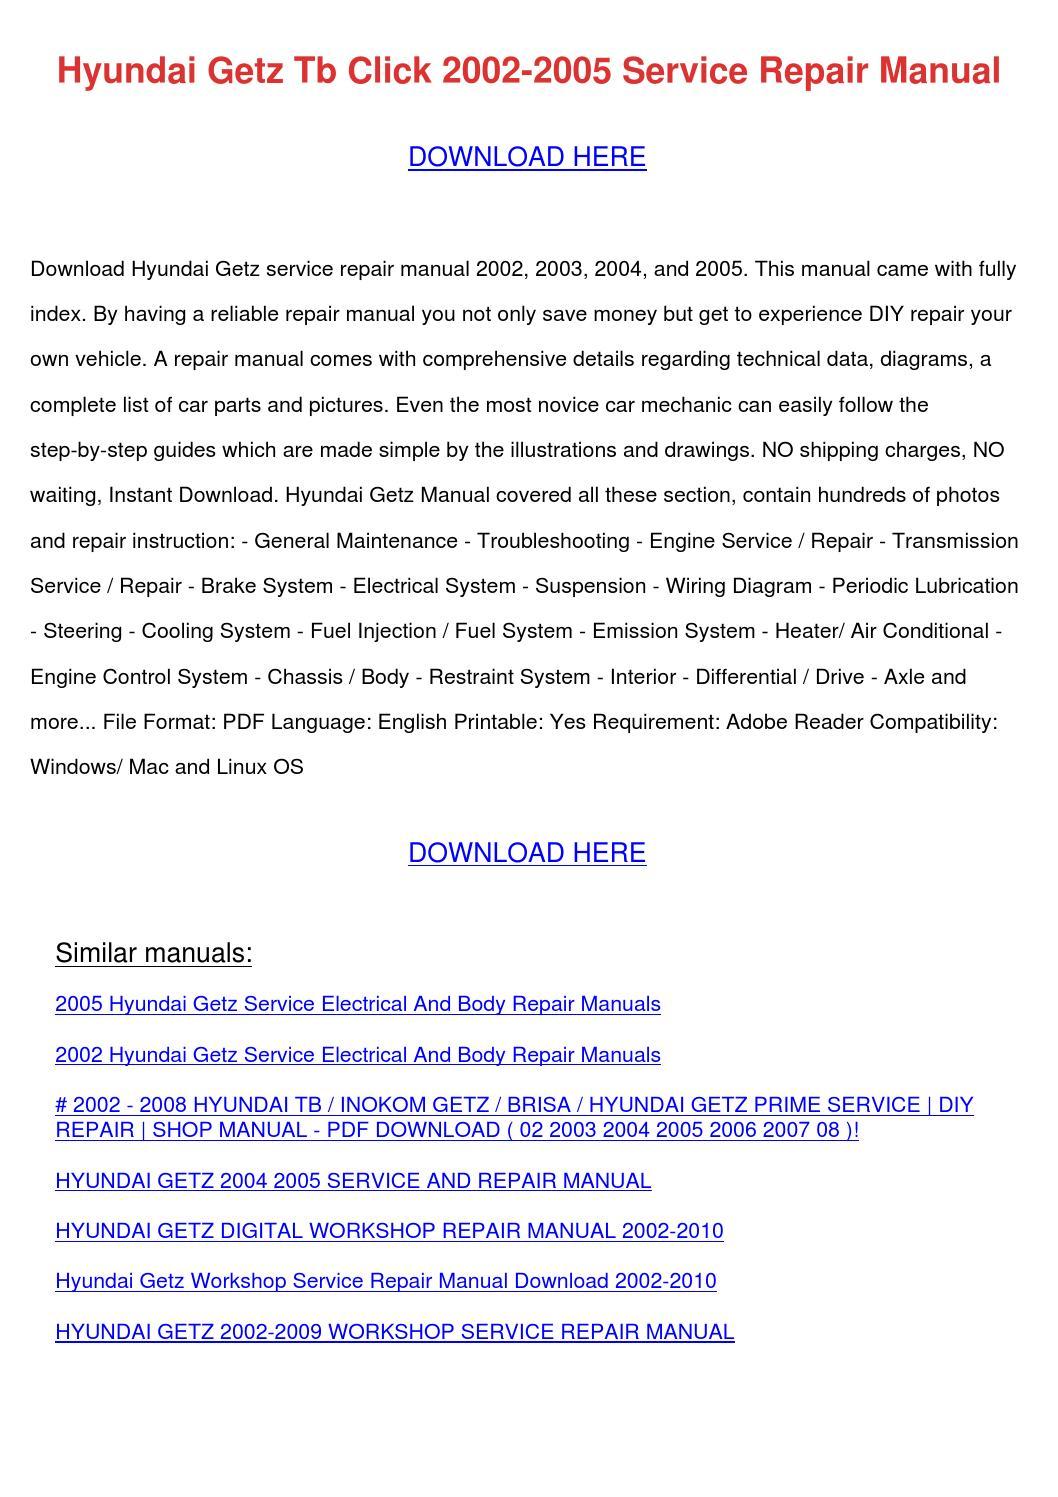 Hyundai Getz Tb Click 2002 2005 Service Repai By